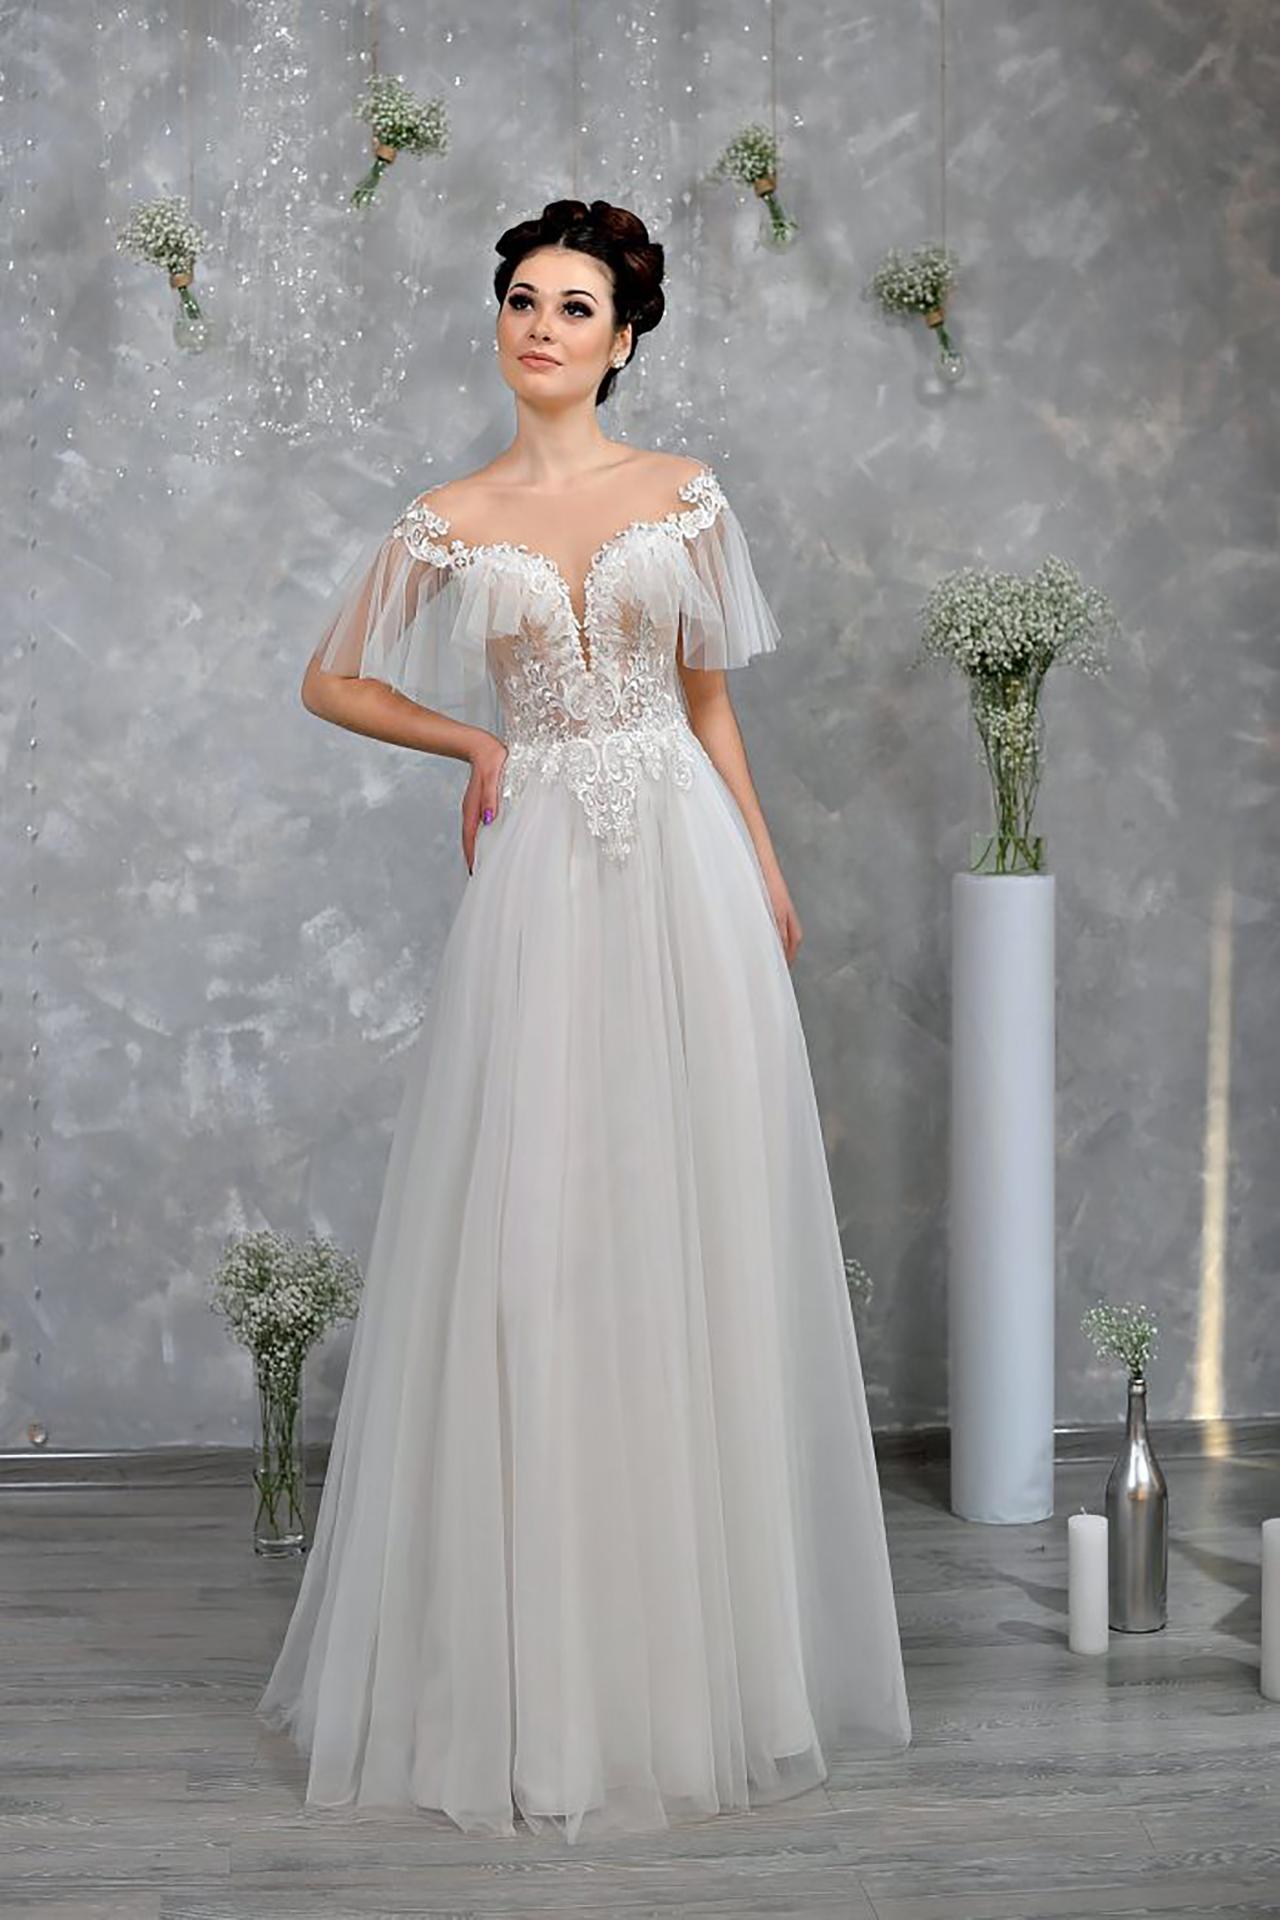 Online Ariadna Wedding Dress Openwork Top With A Loose Skirt